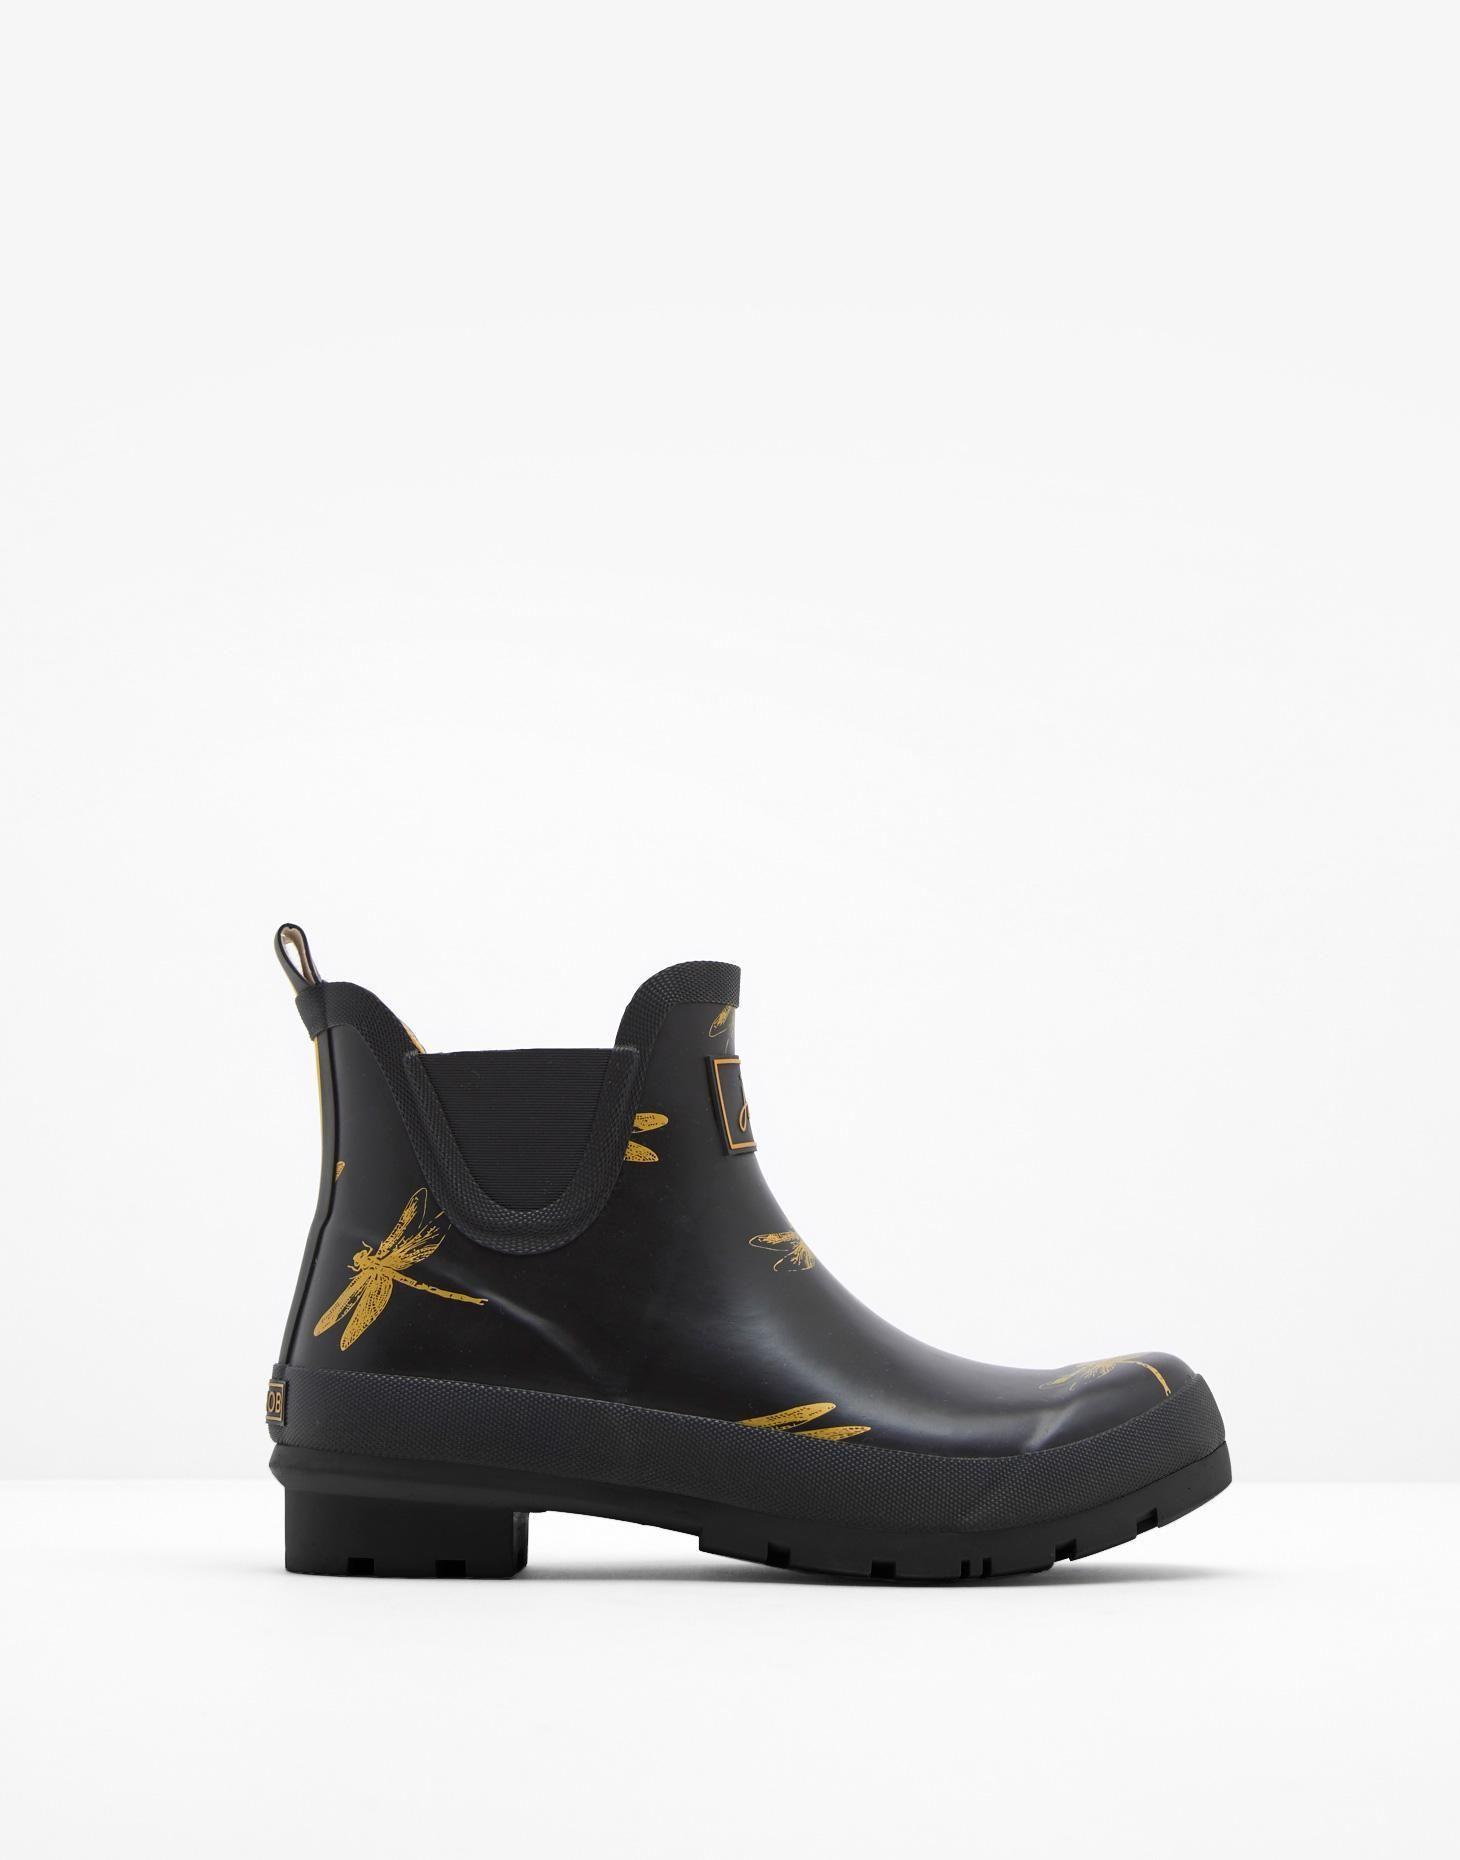 76c3a654ba7 Wellibob Ankle Rain Boots | wishlist | Women's ankle rain boots ...